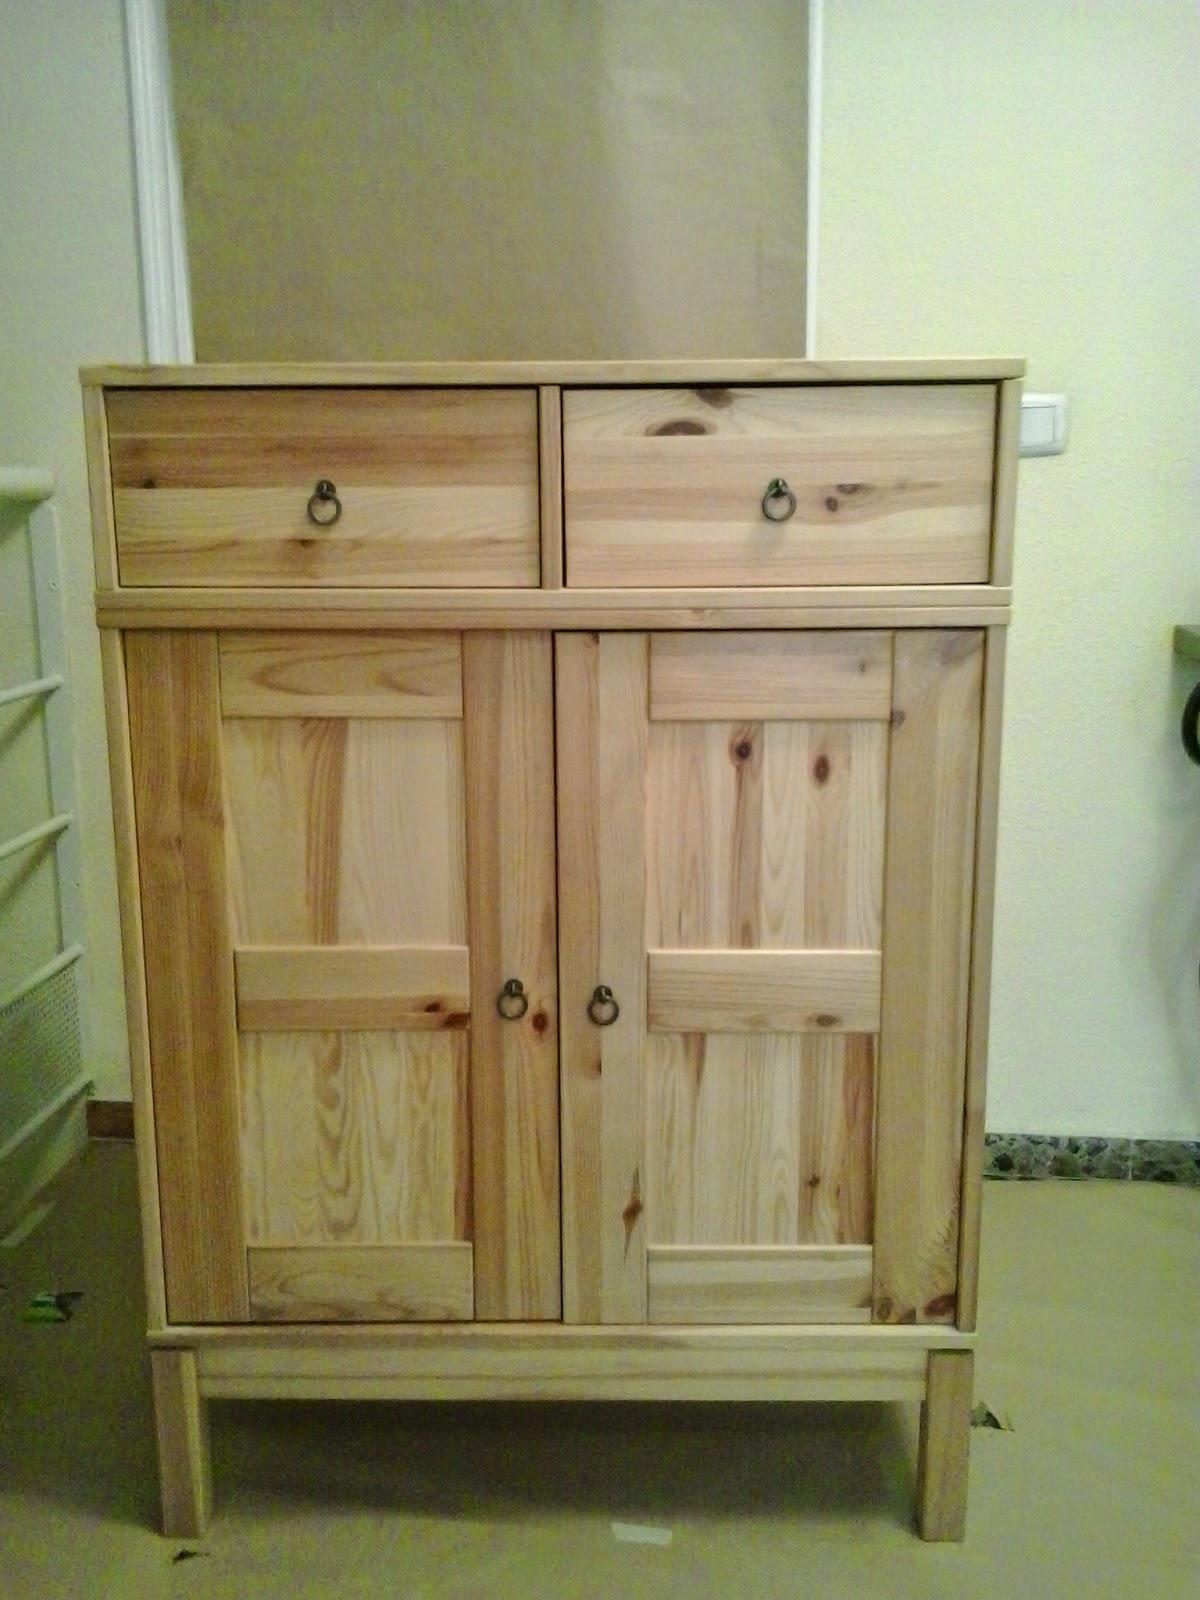 Como pintar muebles de pino interesting muebles multi uso - Muebles pino para pintar ...